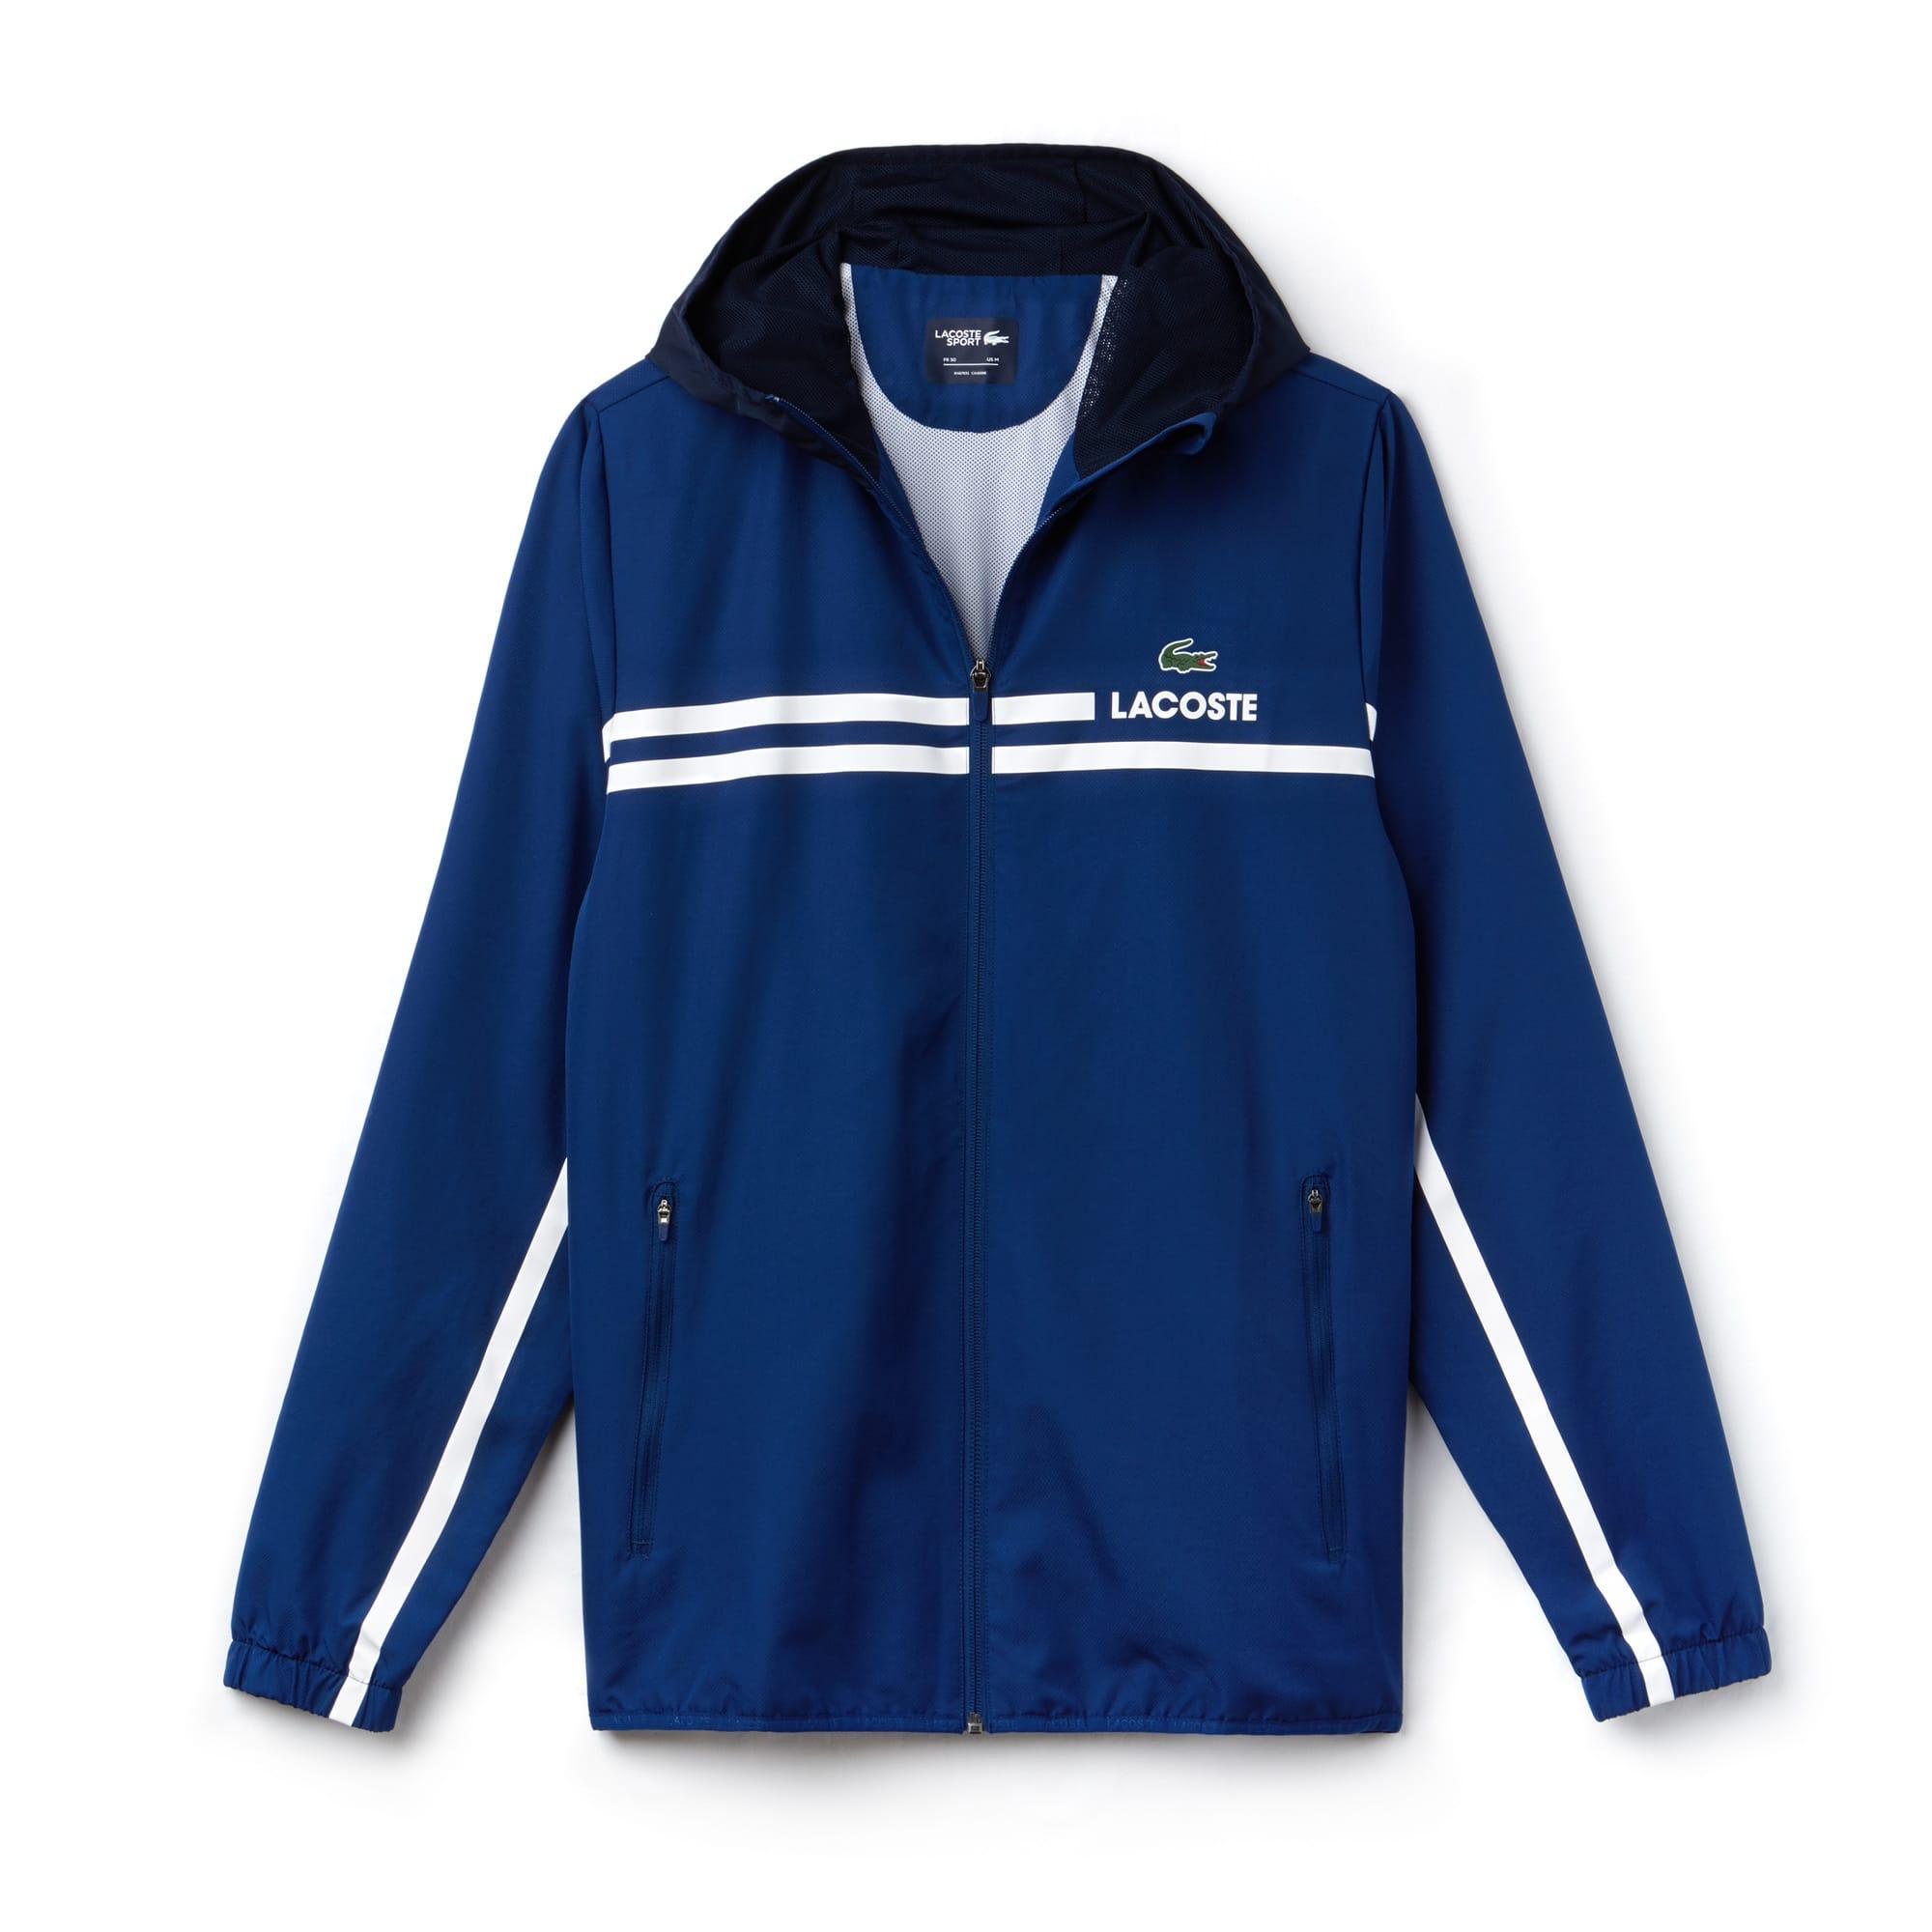 Men's Lacoste SPORT Hooded Taffeta And Mesh Tennis Jacket